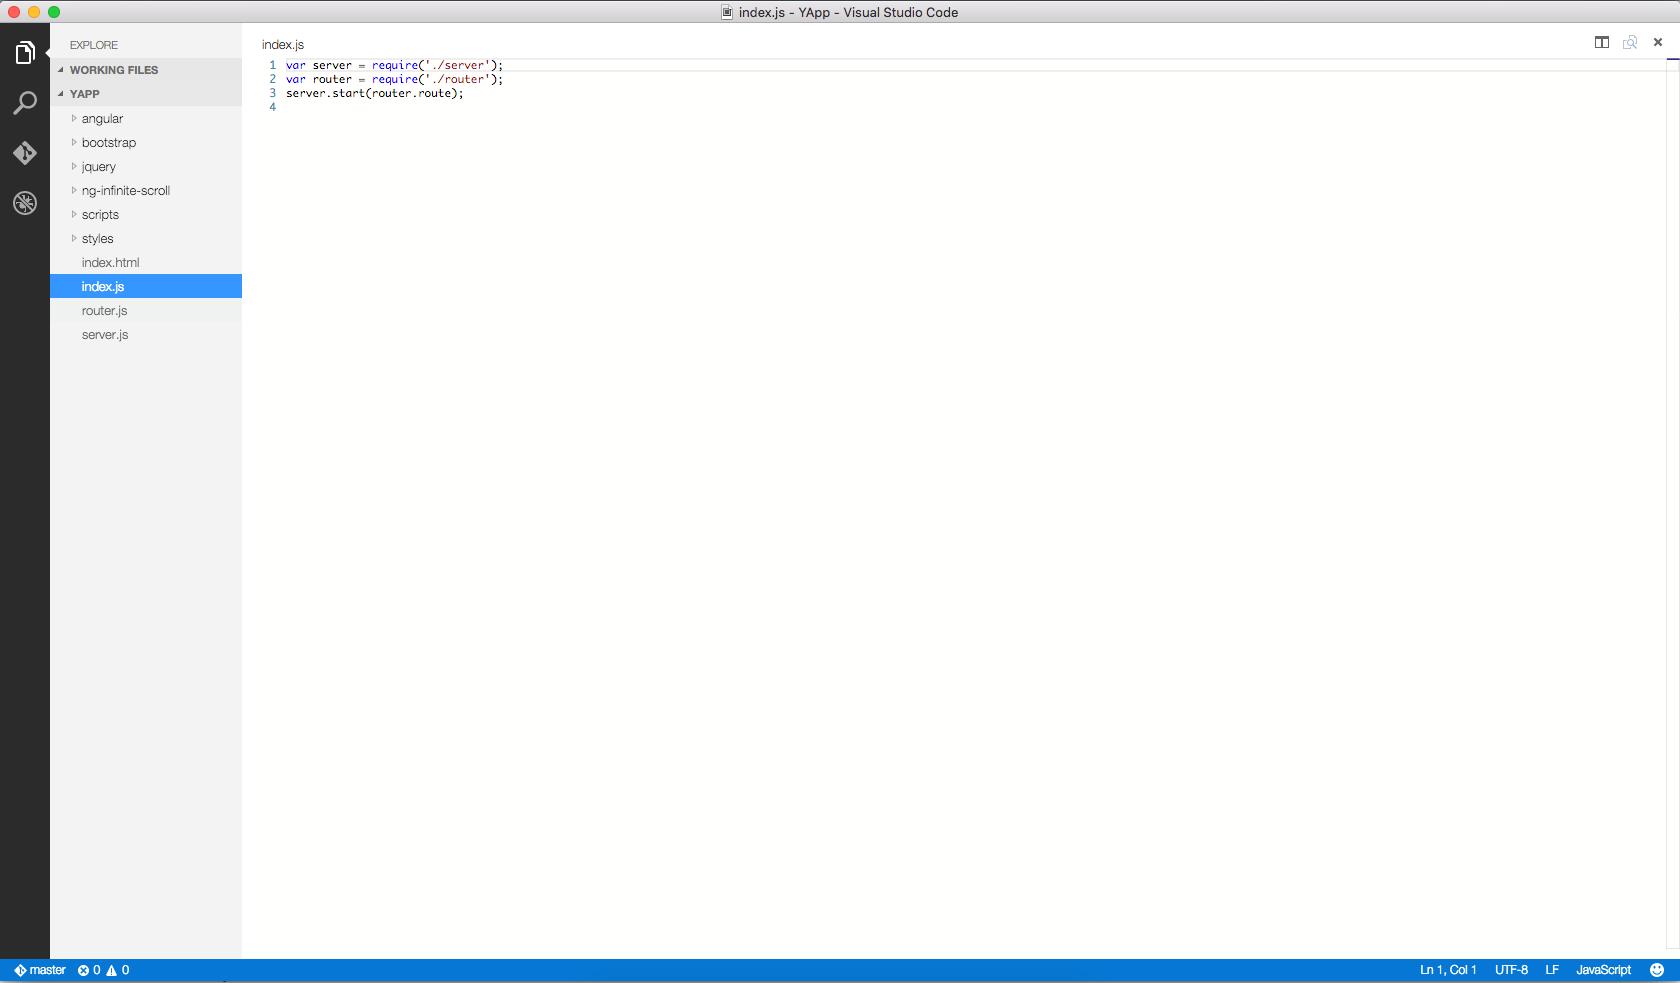 Visula Studio Code